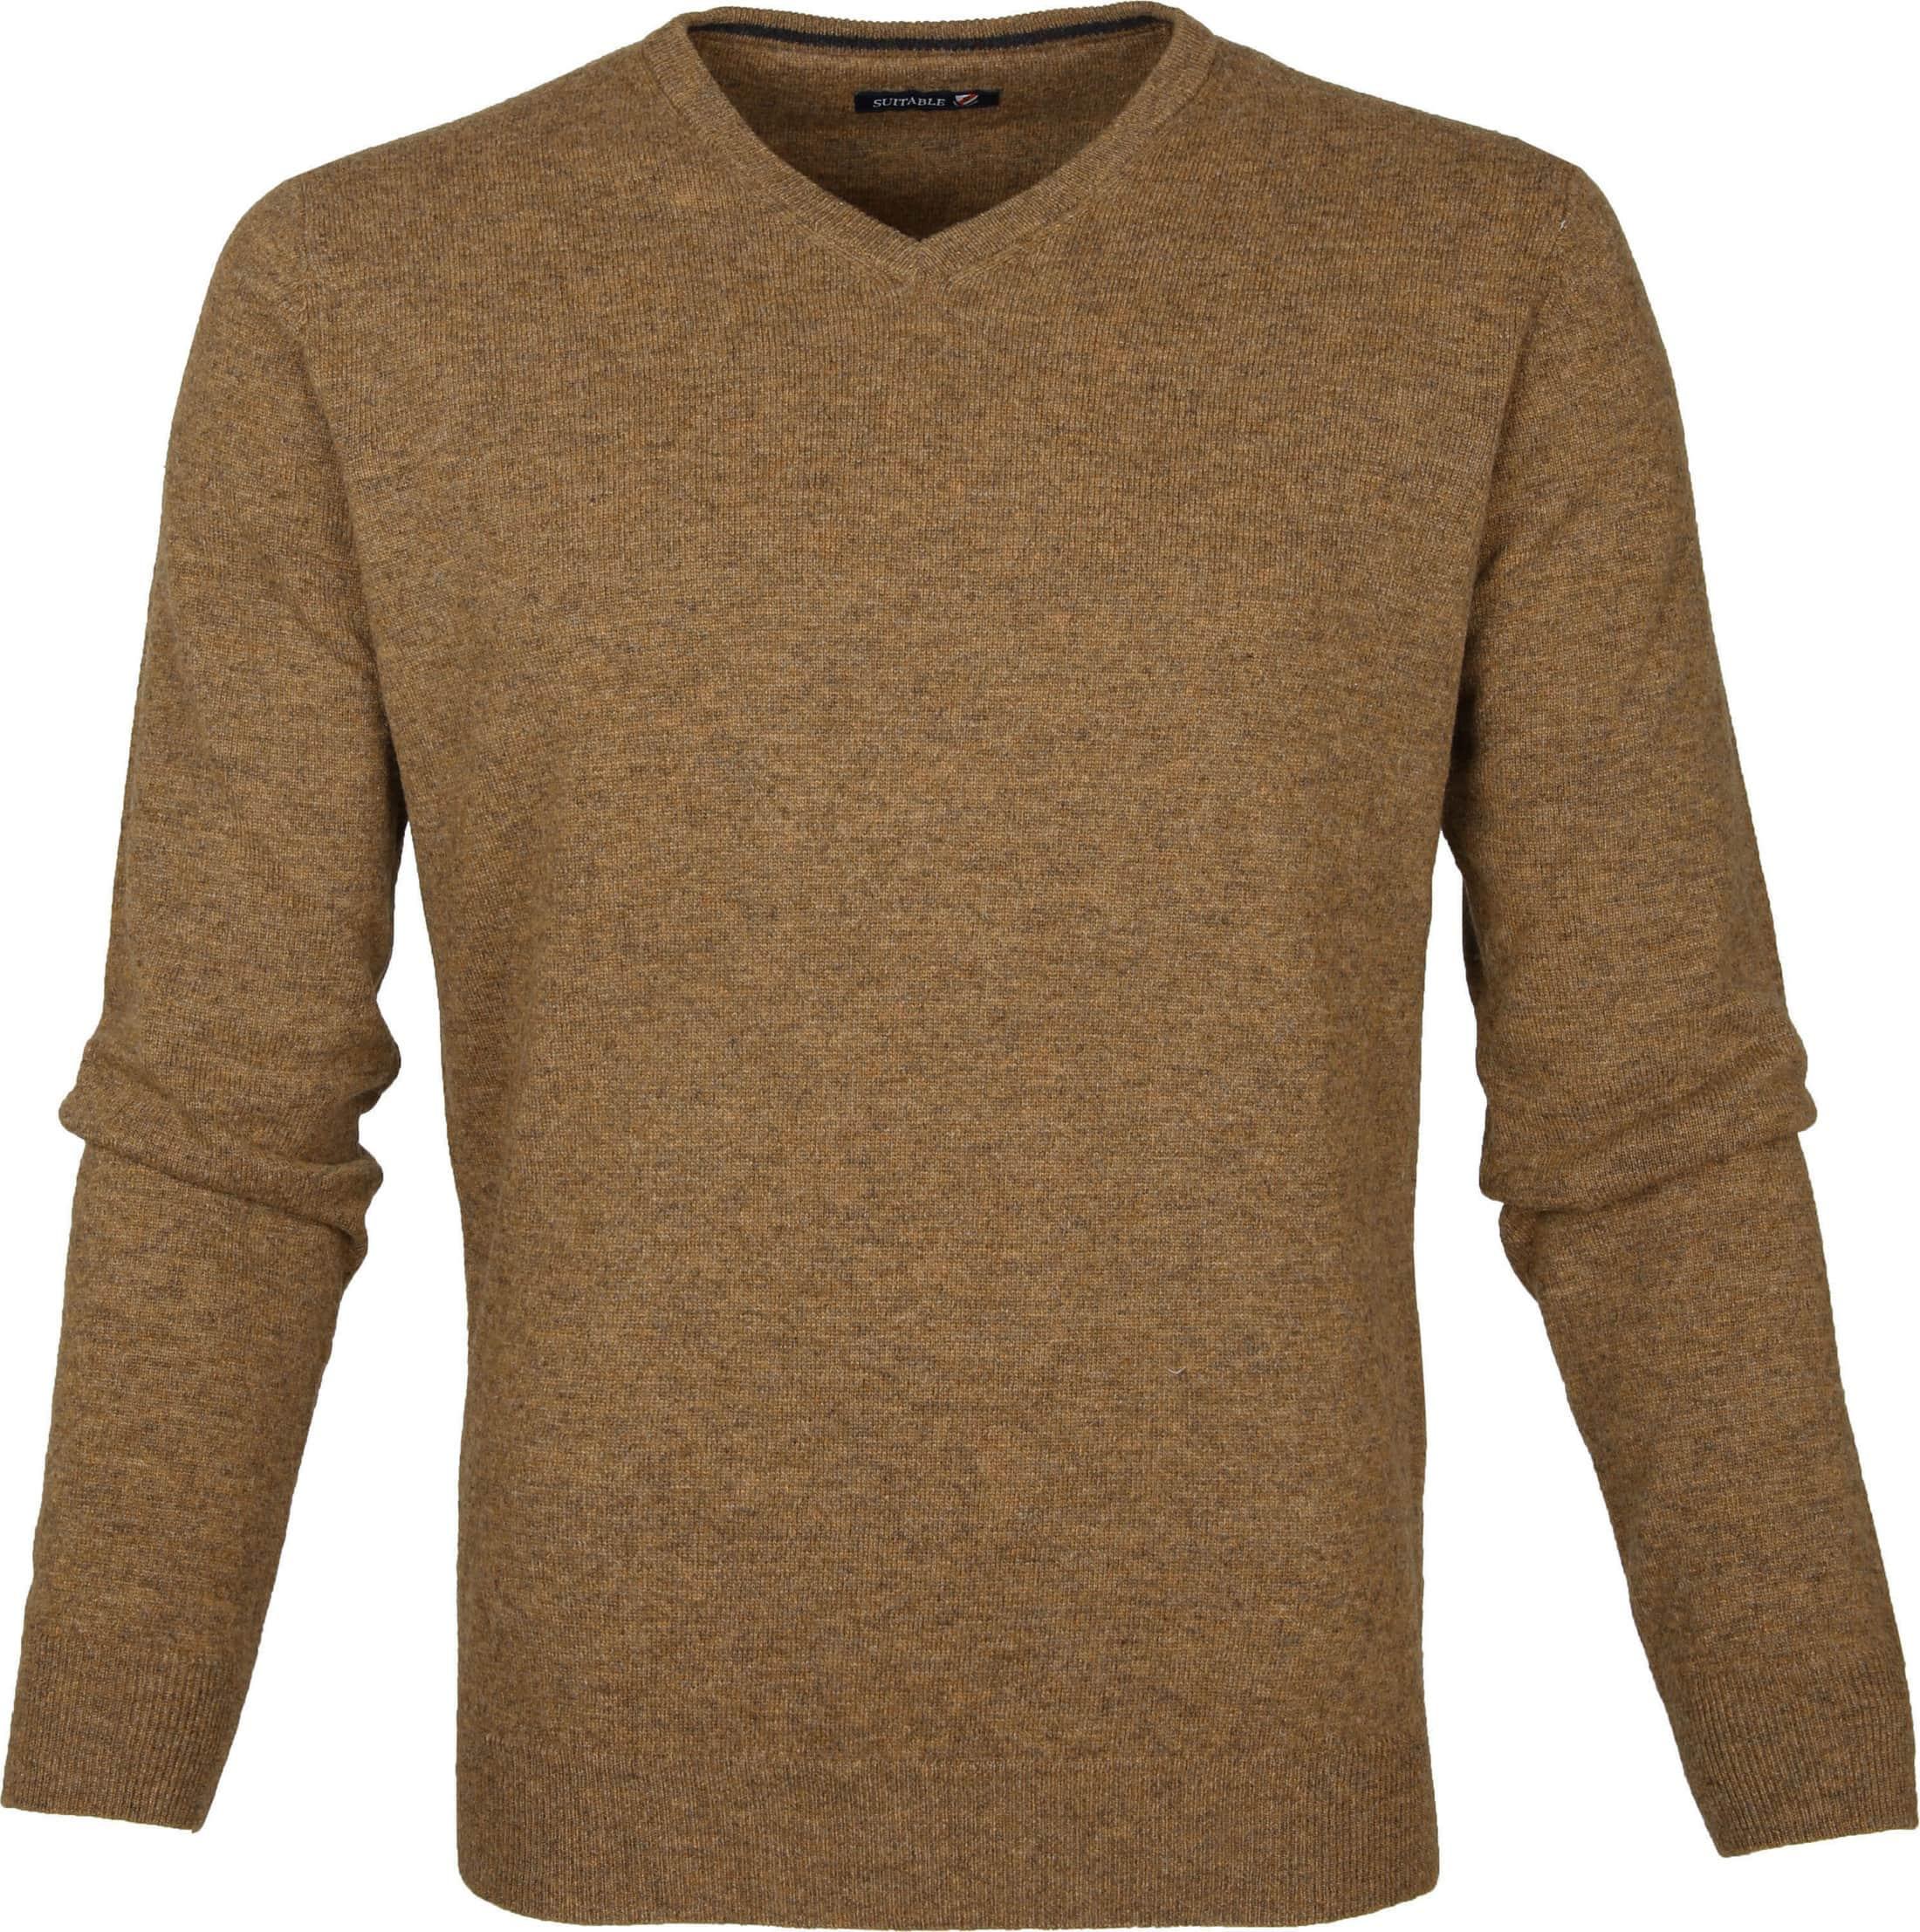 Suitable Pullover Lammwolle V-Ausschnitt Kamel foto 0